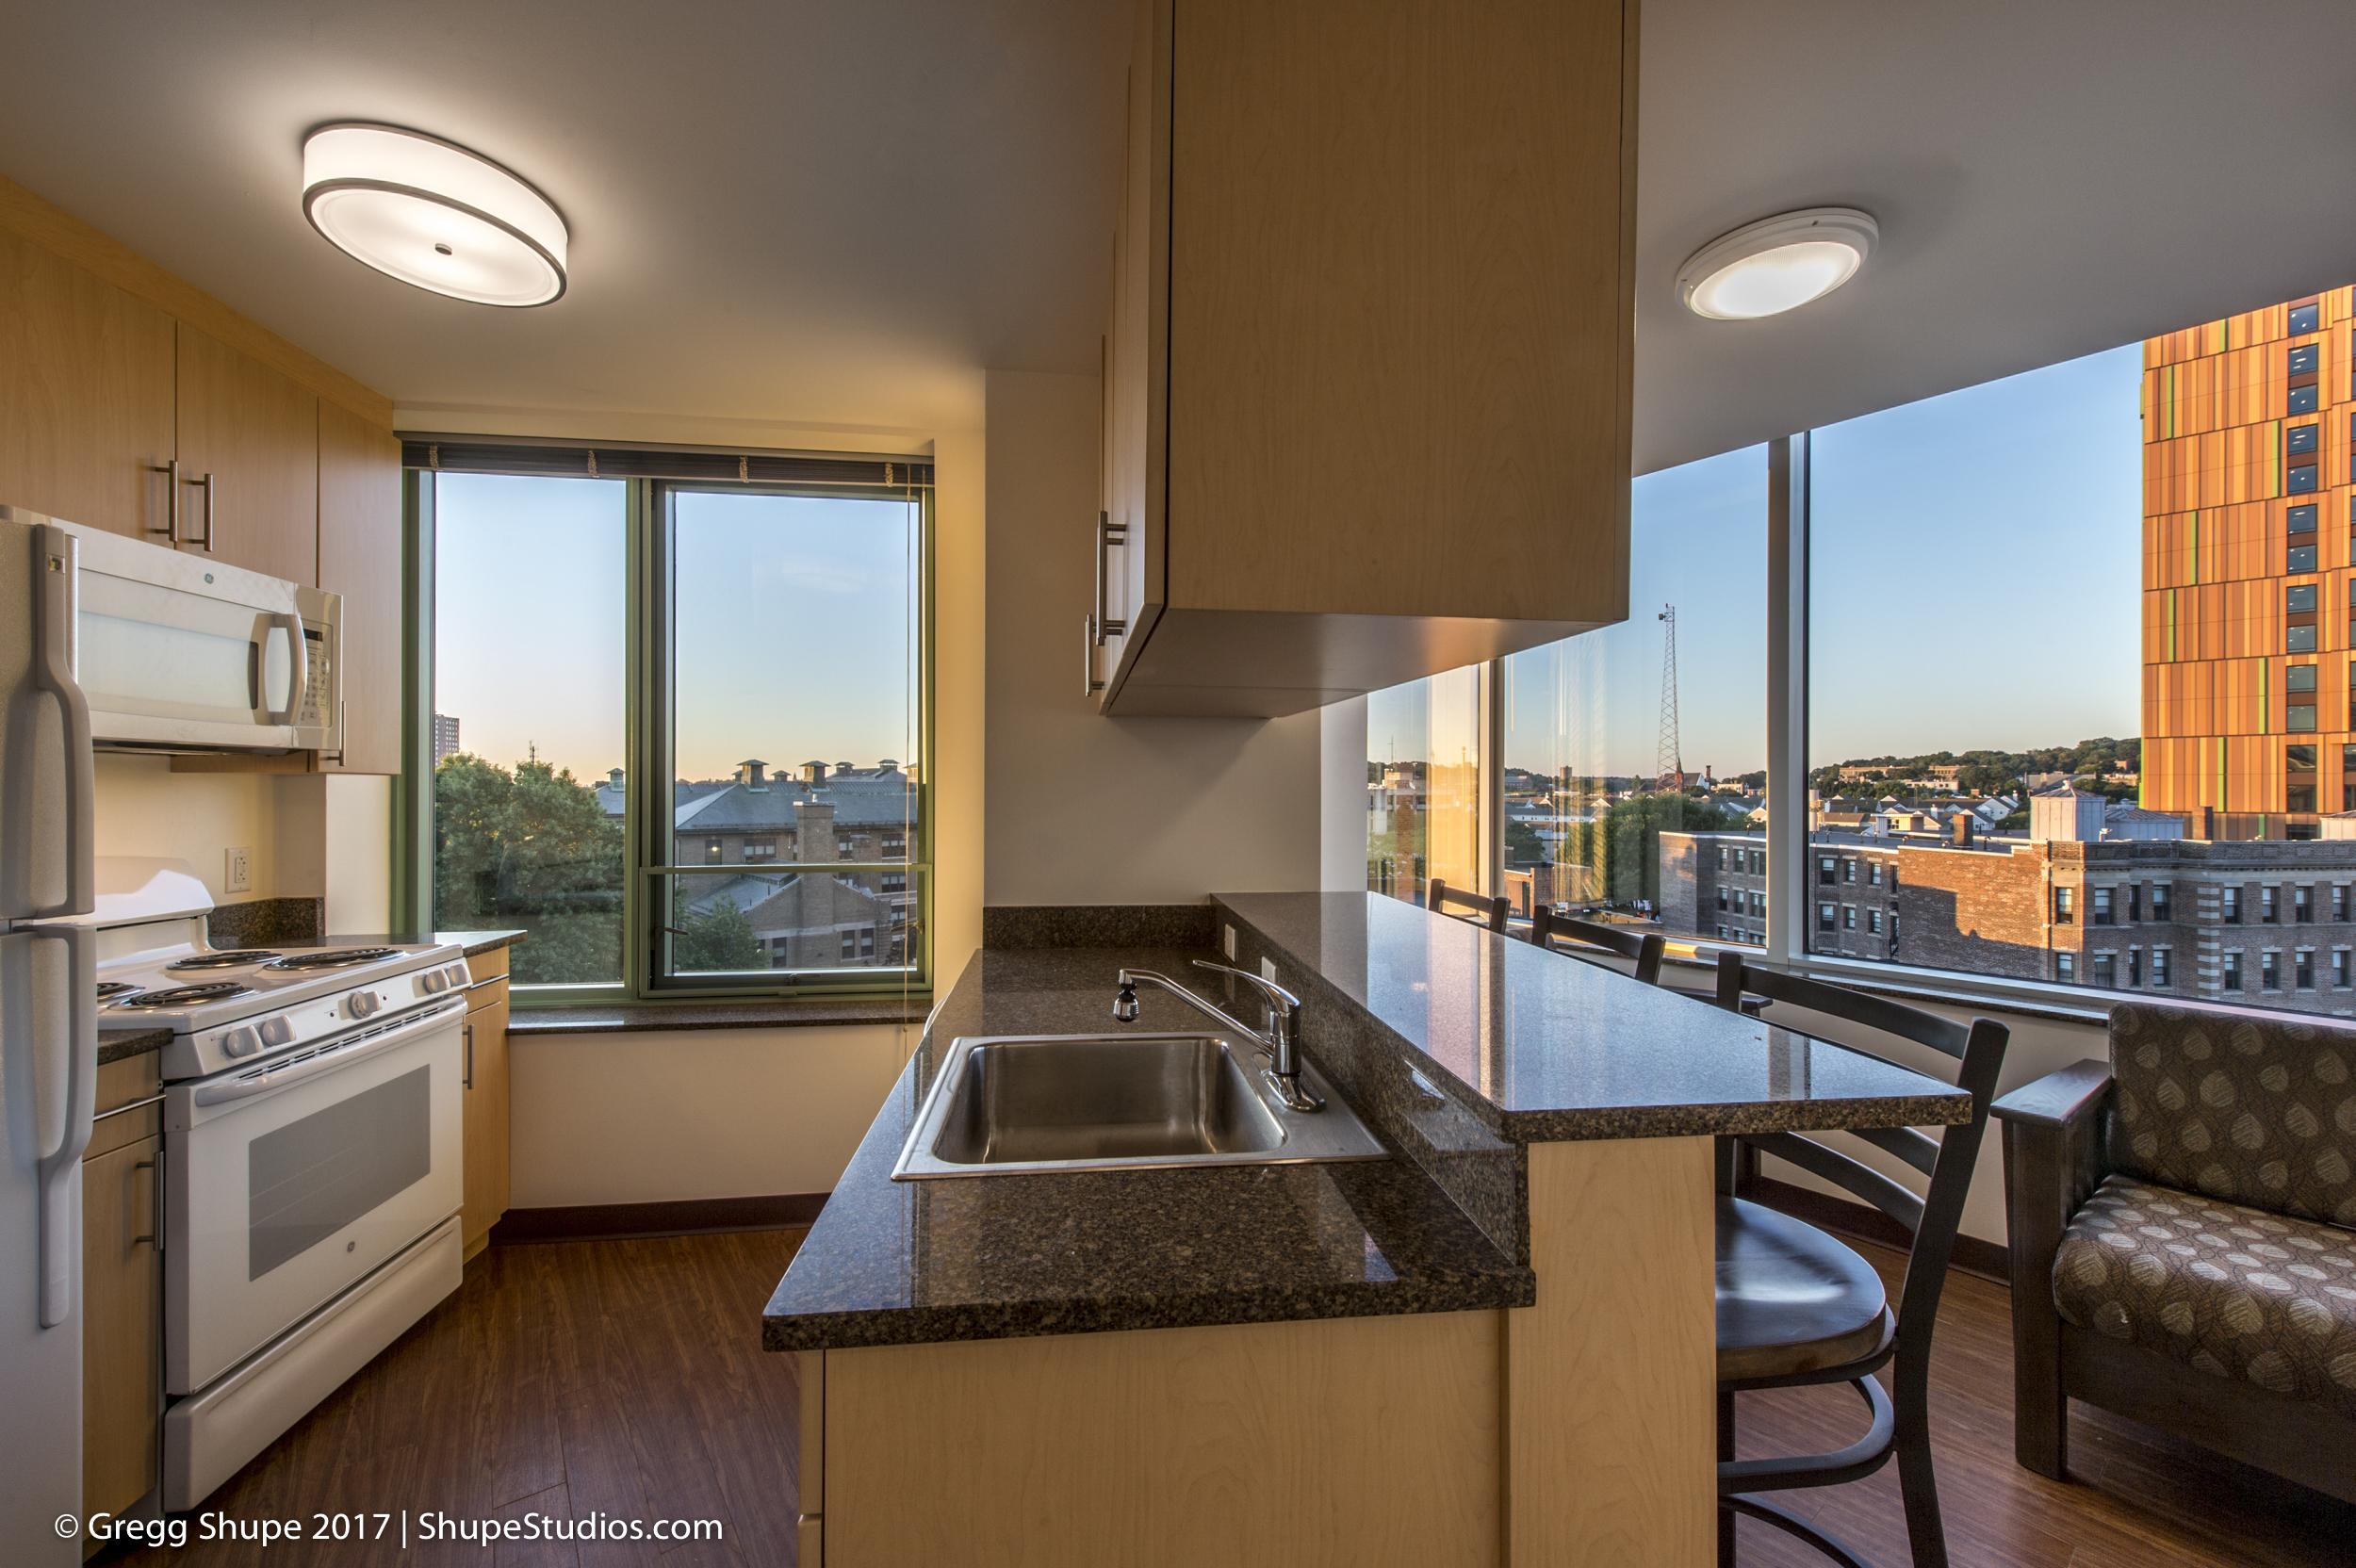 084e_140904_Apartments_At_525_Huntington_Ave.jpg